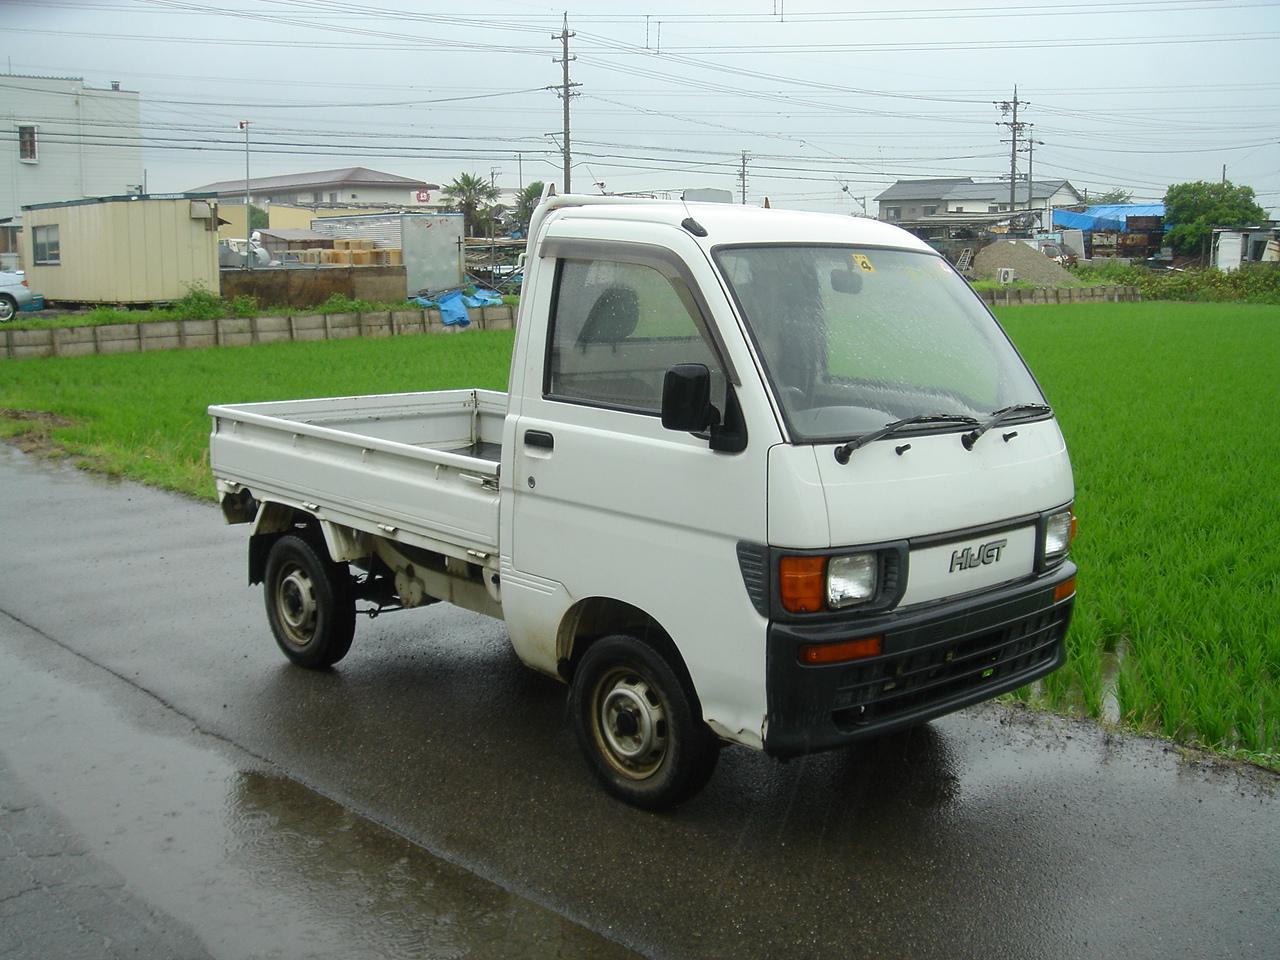 Daihatsu Hijet Truck 1995 Used For Sale